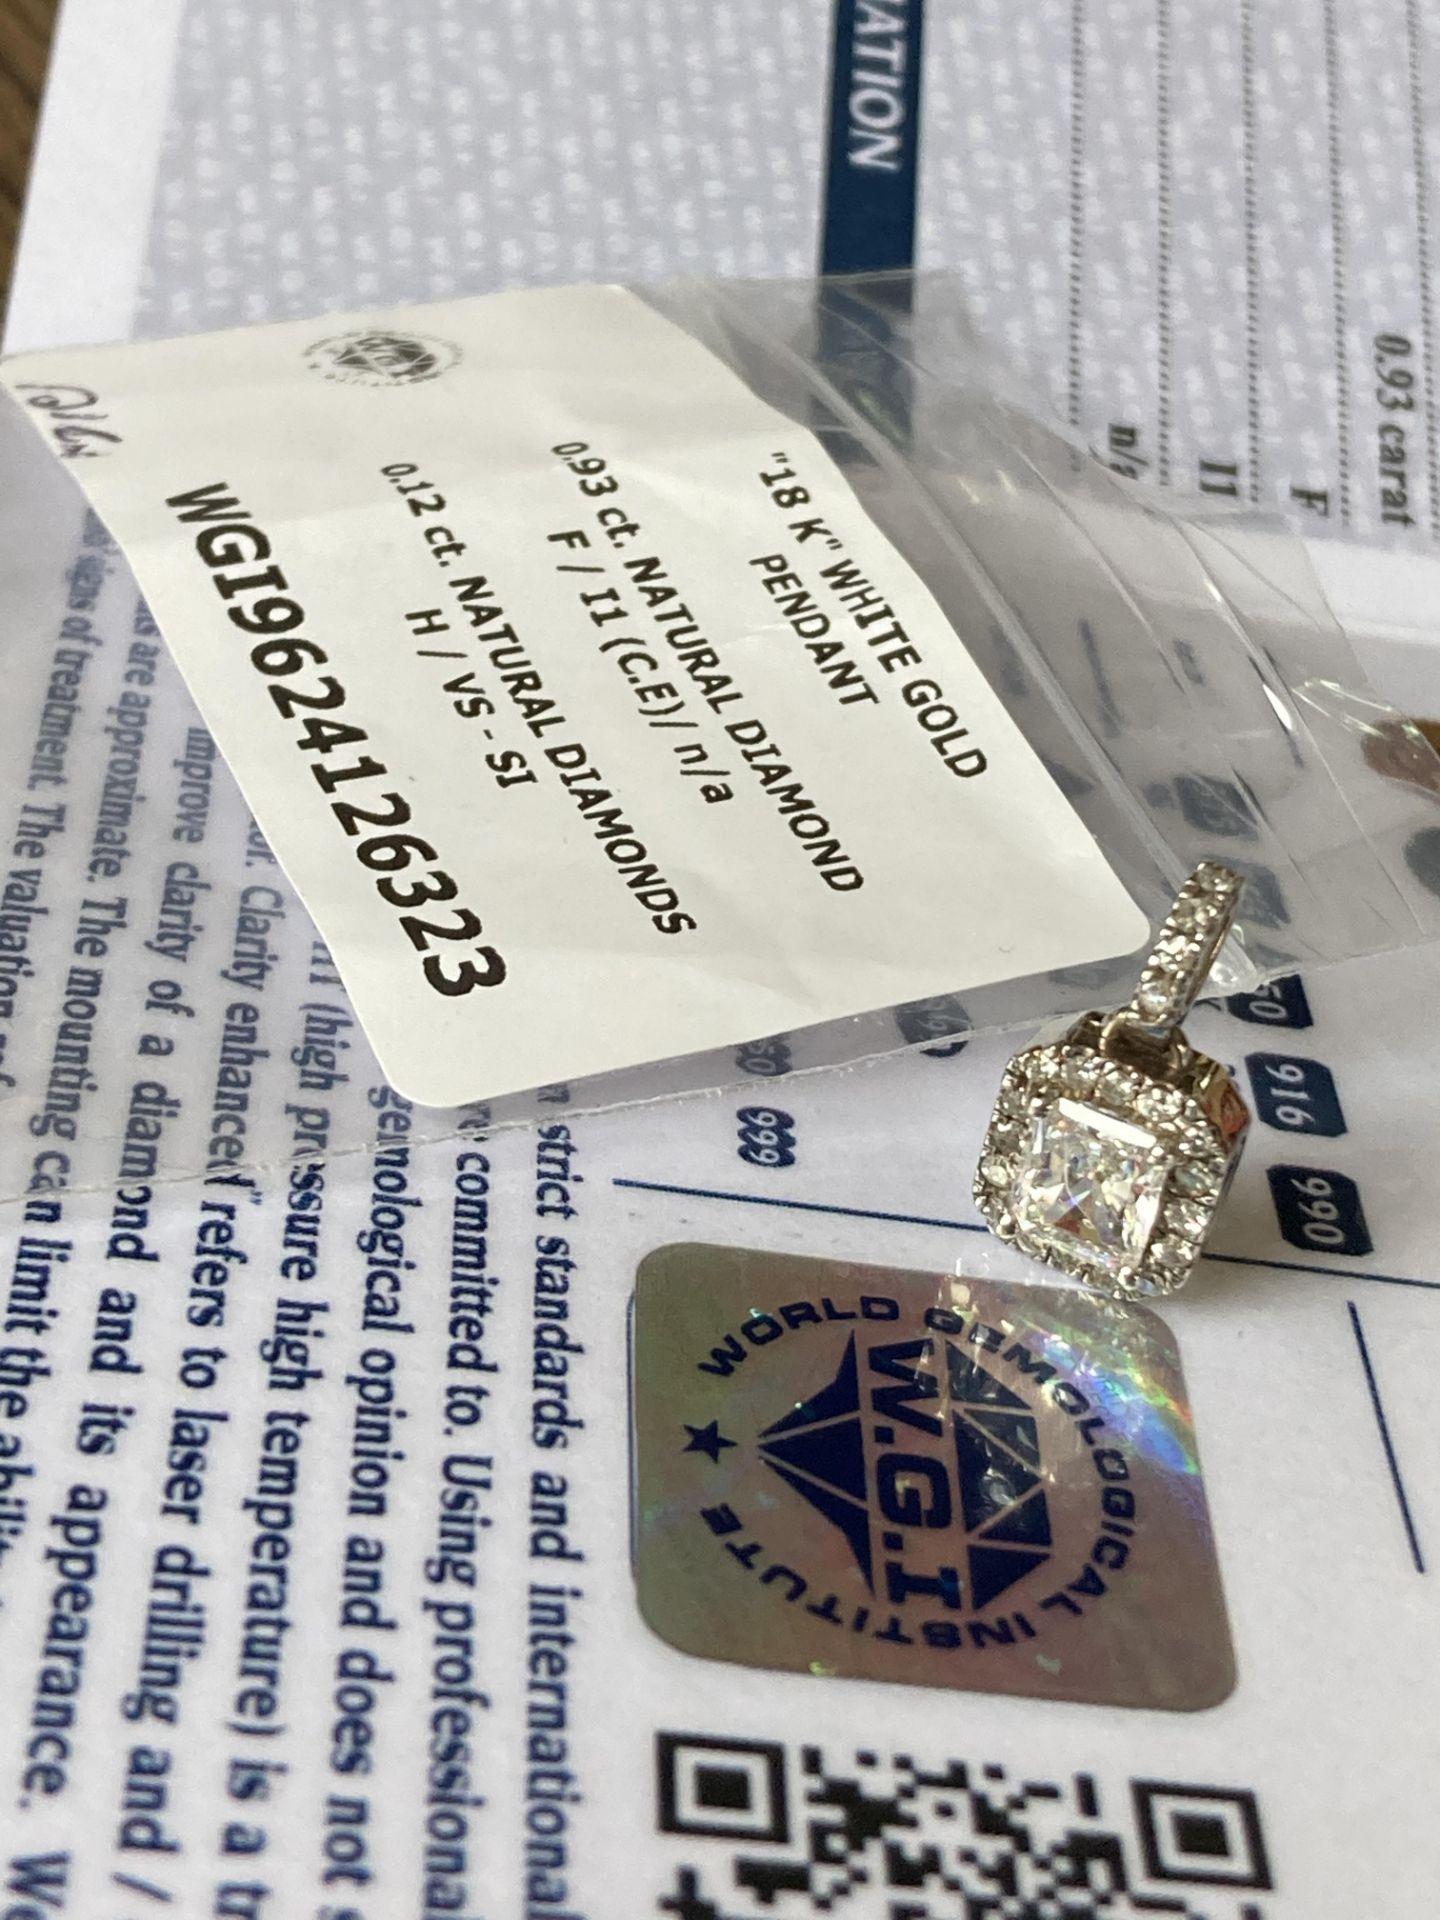 1.05CT DIAMOND PENDANT - 18K WHITE GOLD (WGI CERTIFICATE) - Image 5 of 5